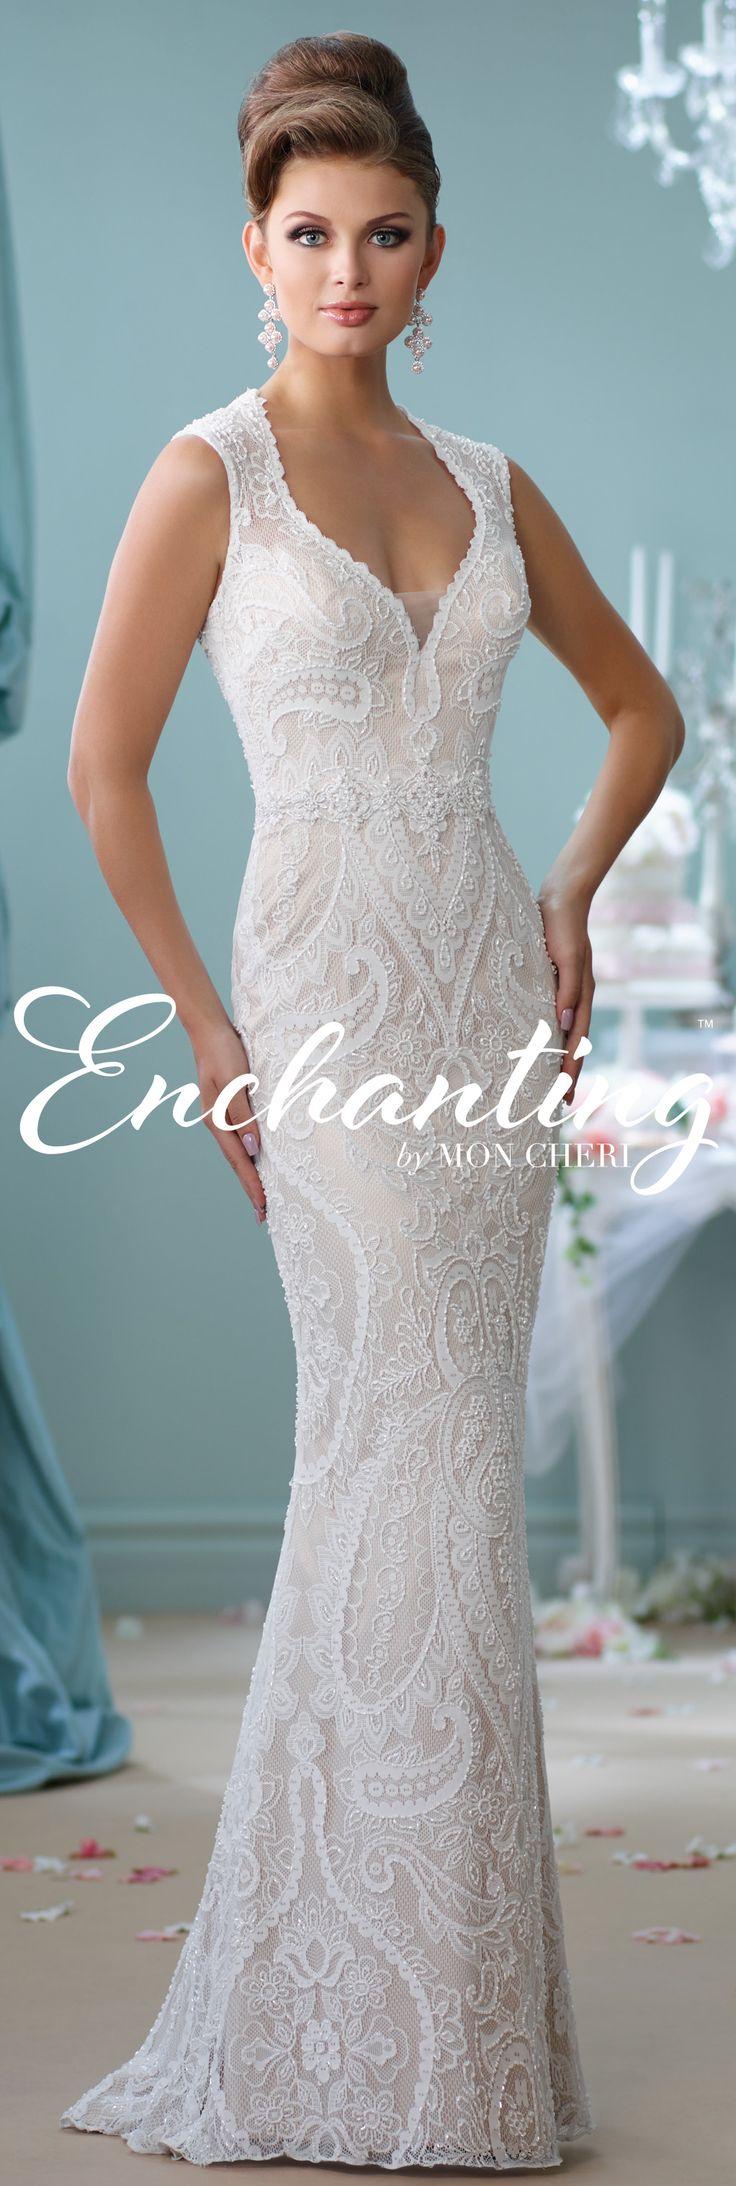 Enchanting by Mon Cheri Spring 2016 ~Style No. 116123 #laceweddingdress